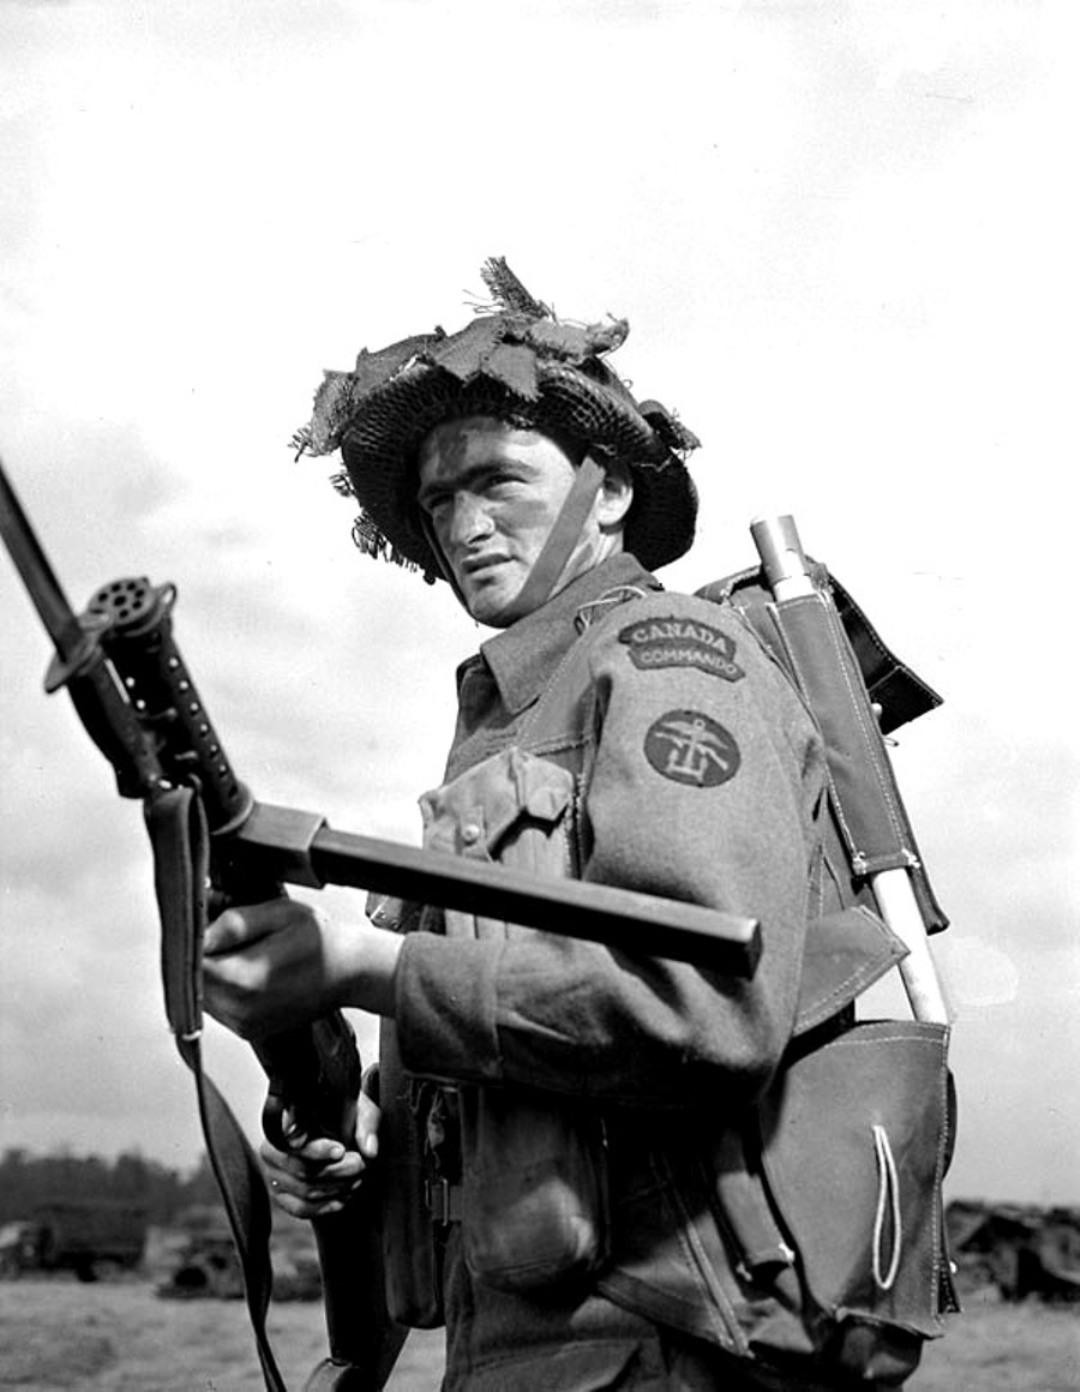 Vintage Saturday: Commando, Eh? – Forgotten Weapons